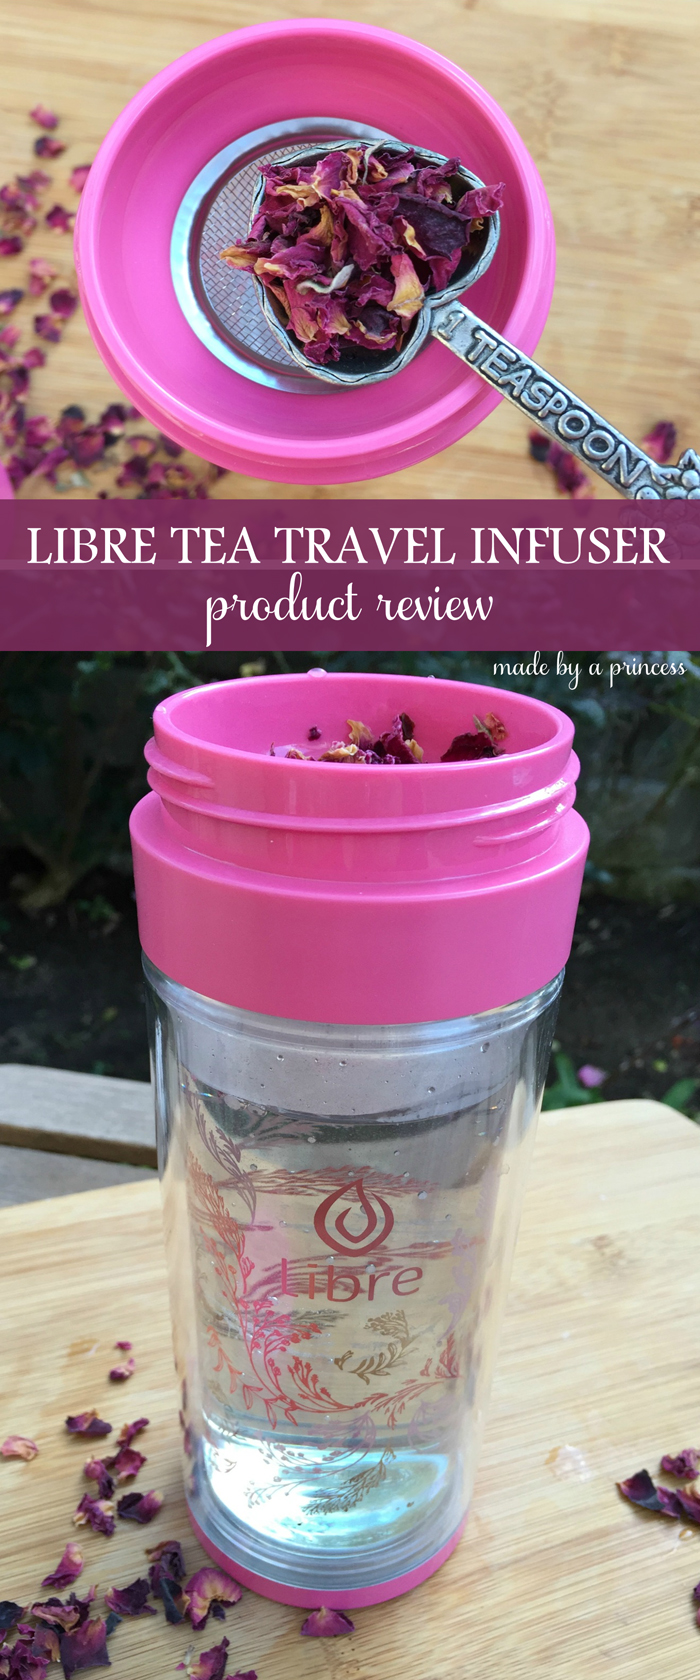 libre tea travel infuser review